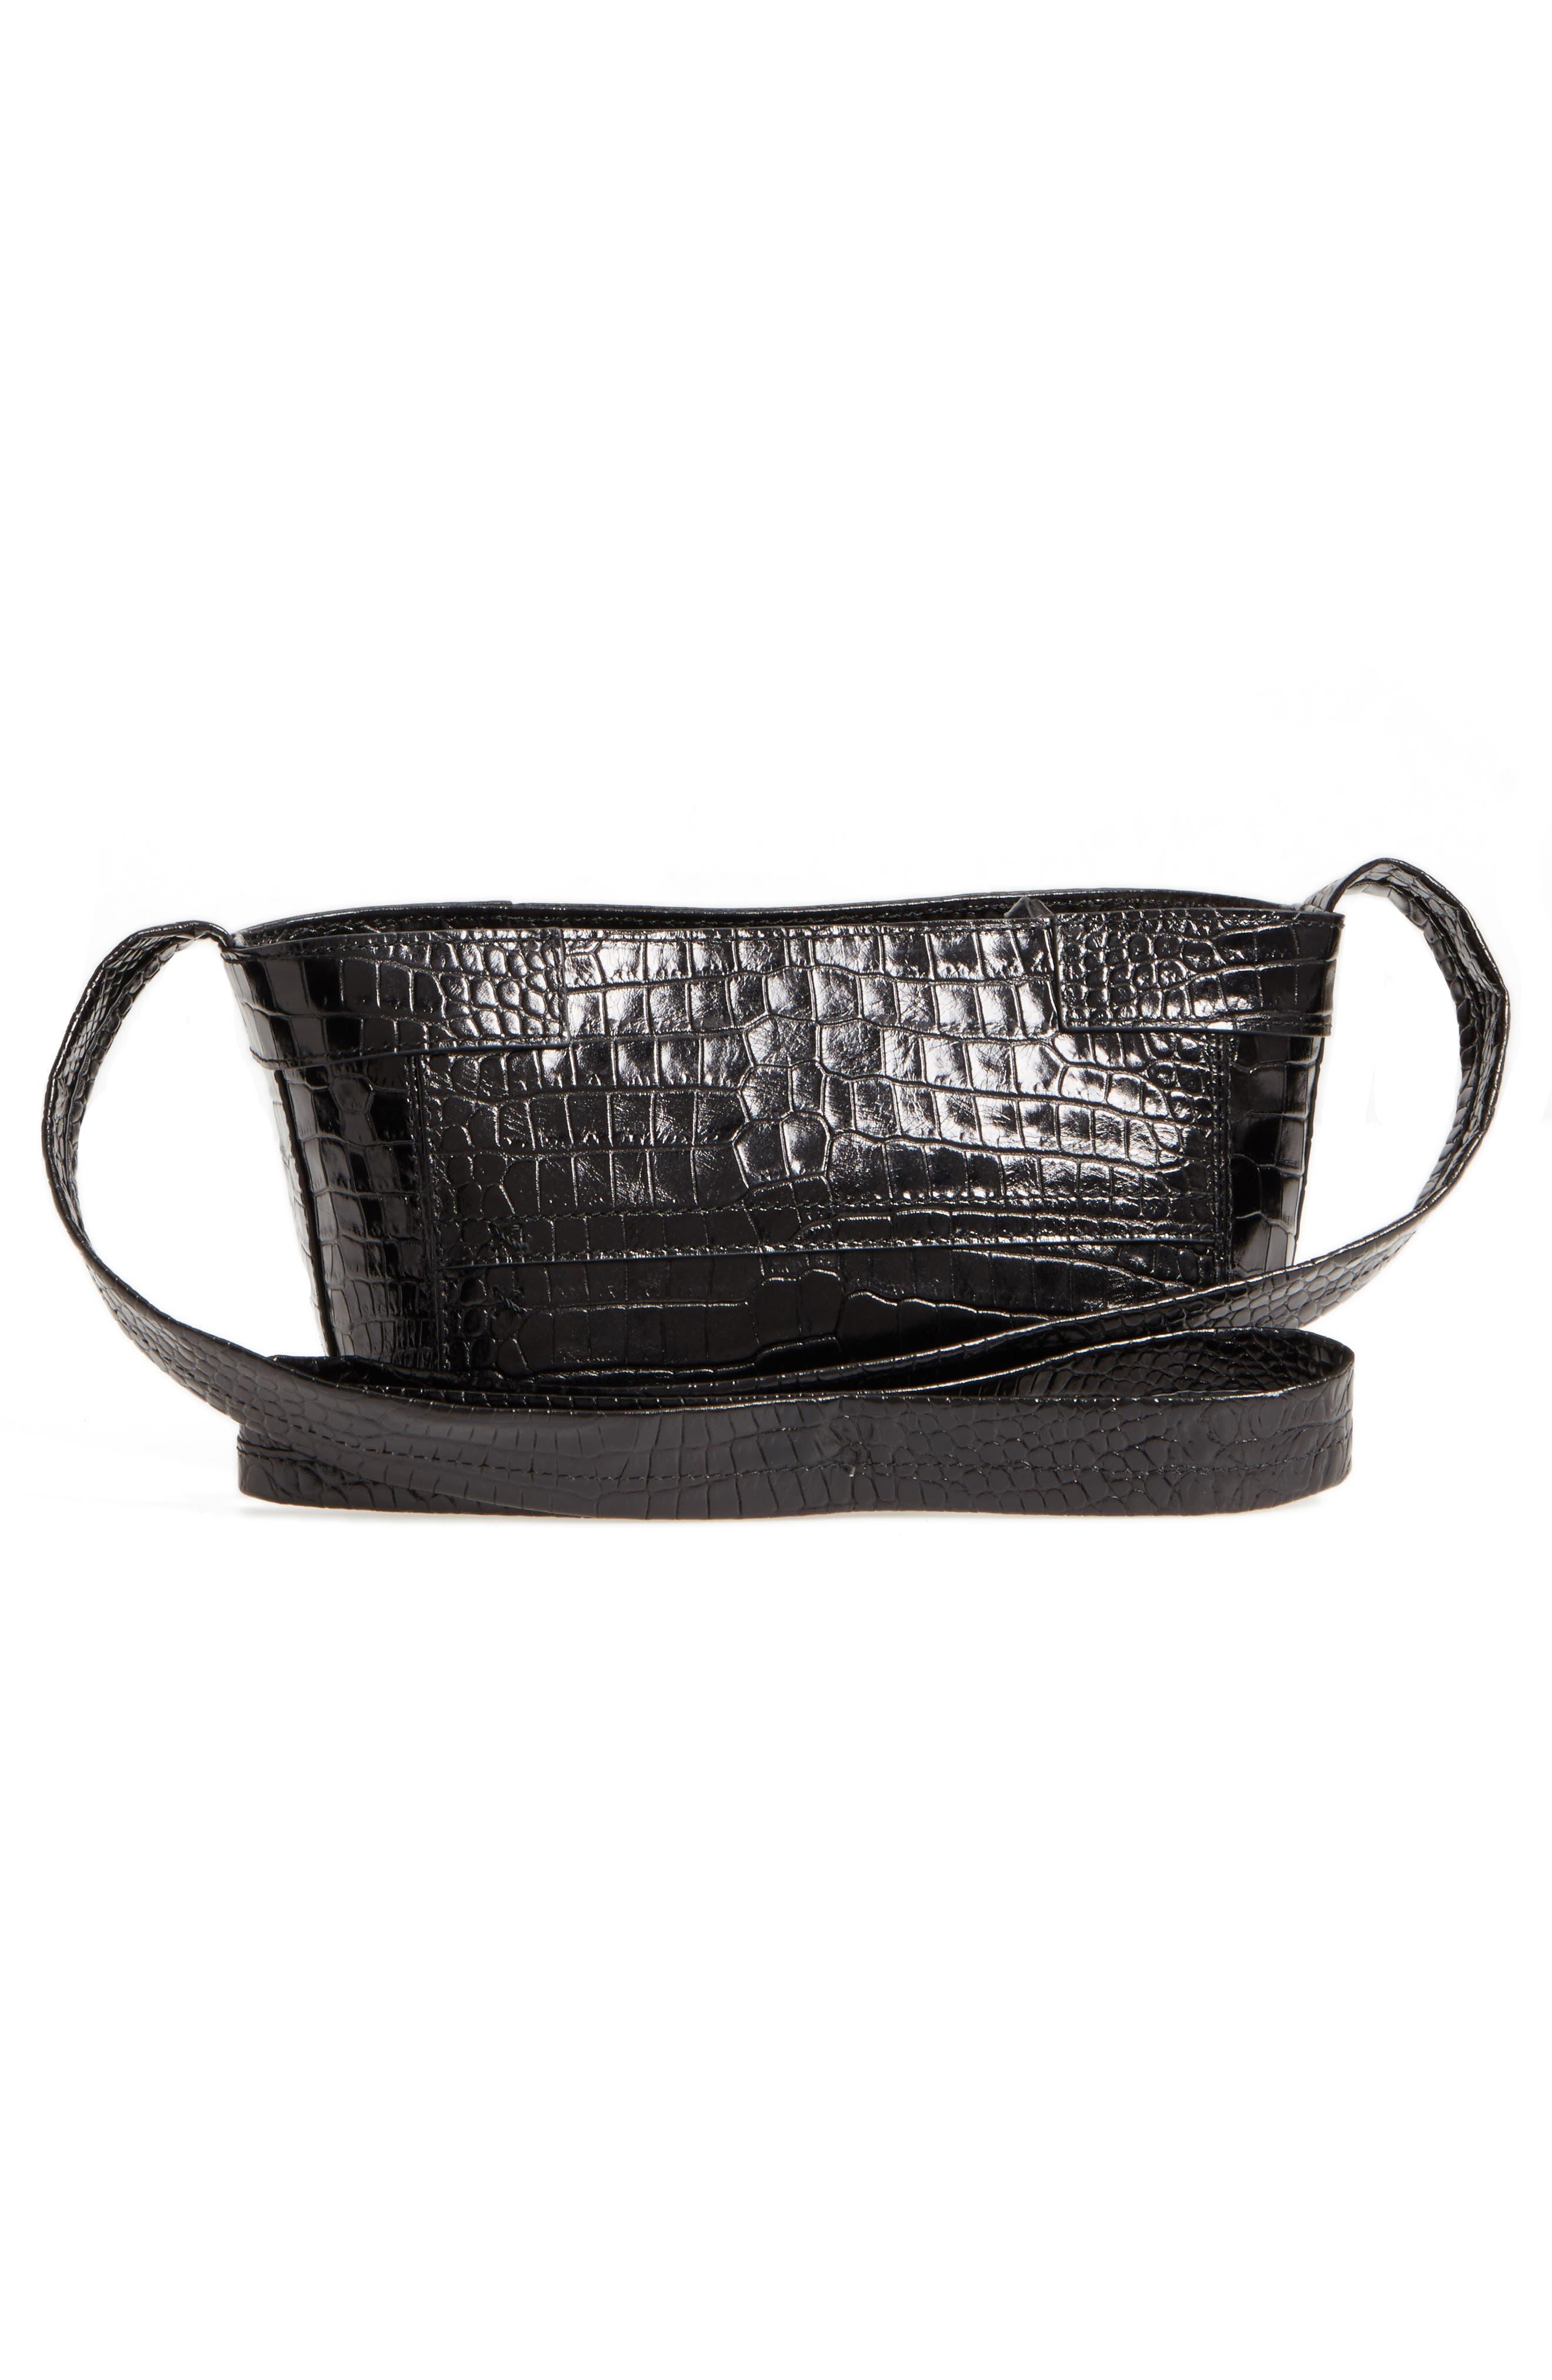 Keely Leather Crossbody Bag,                             Alternate thumbnail 3, color,                             Black